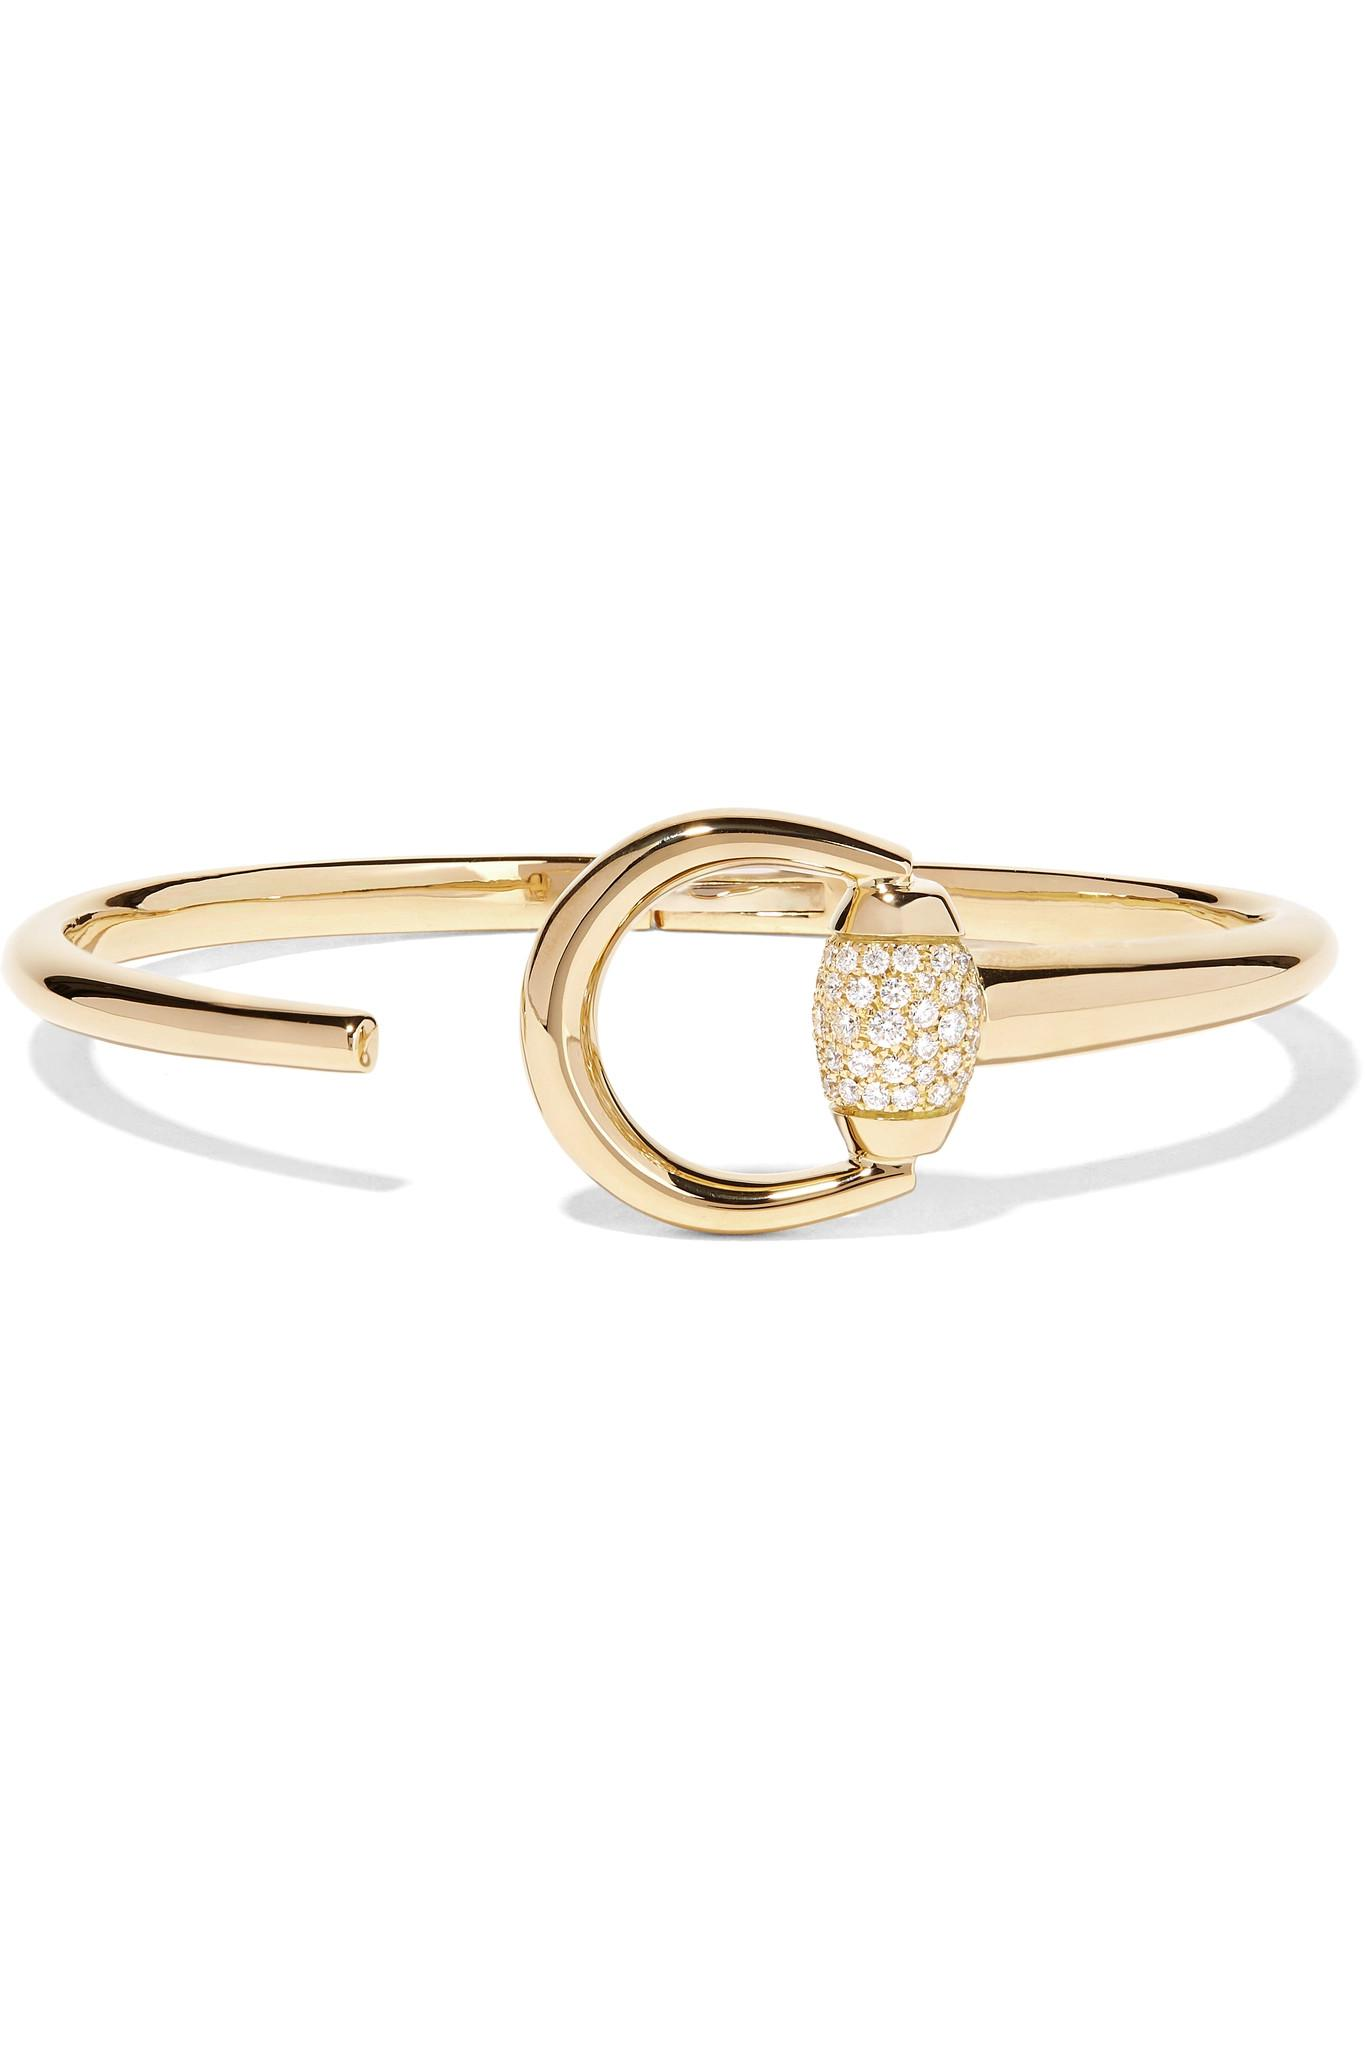 Gucci 18-karat Gold Diamond Ring kSIAKLsTY